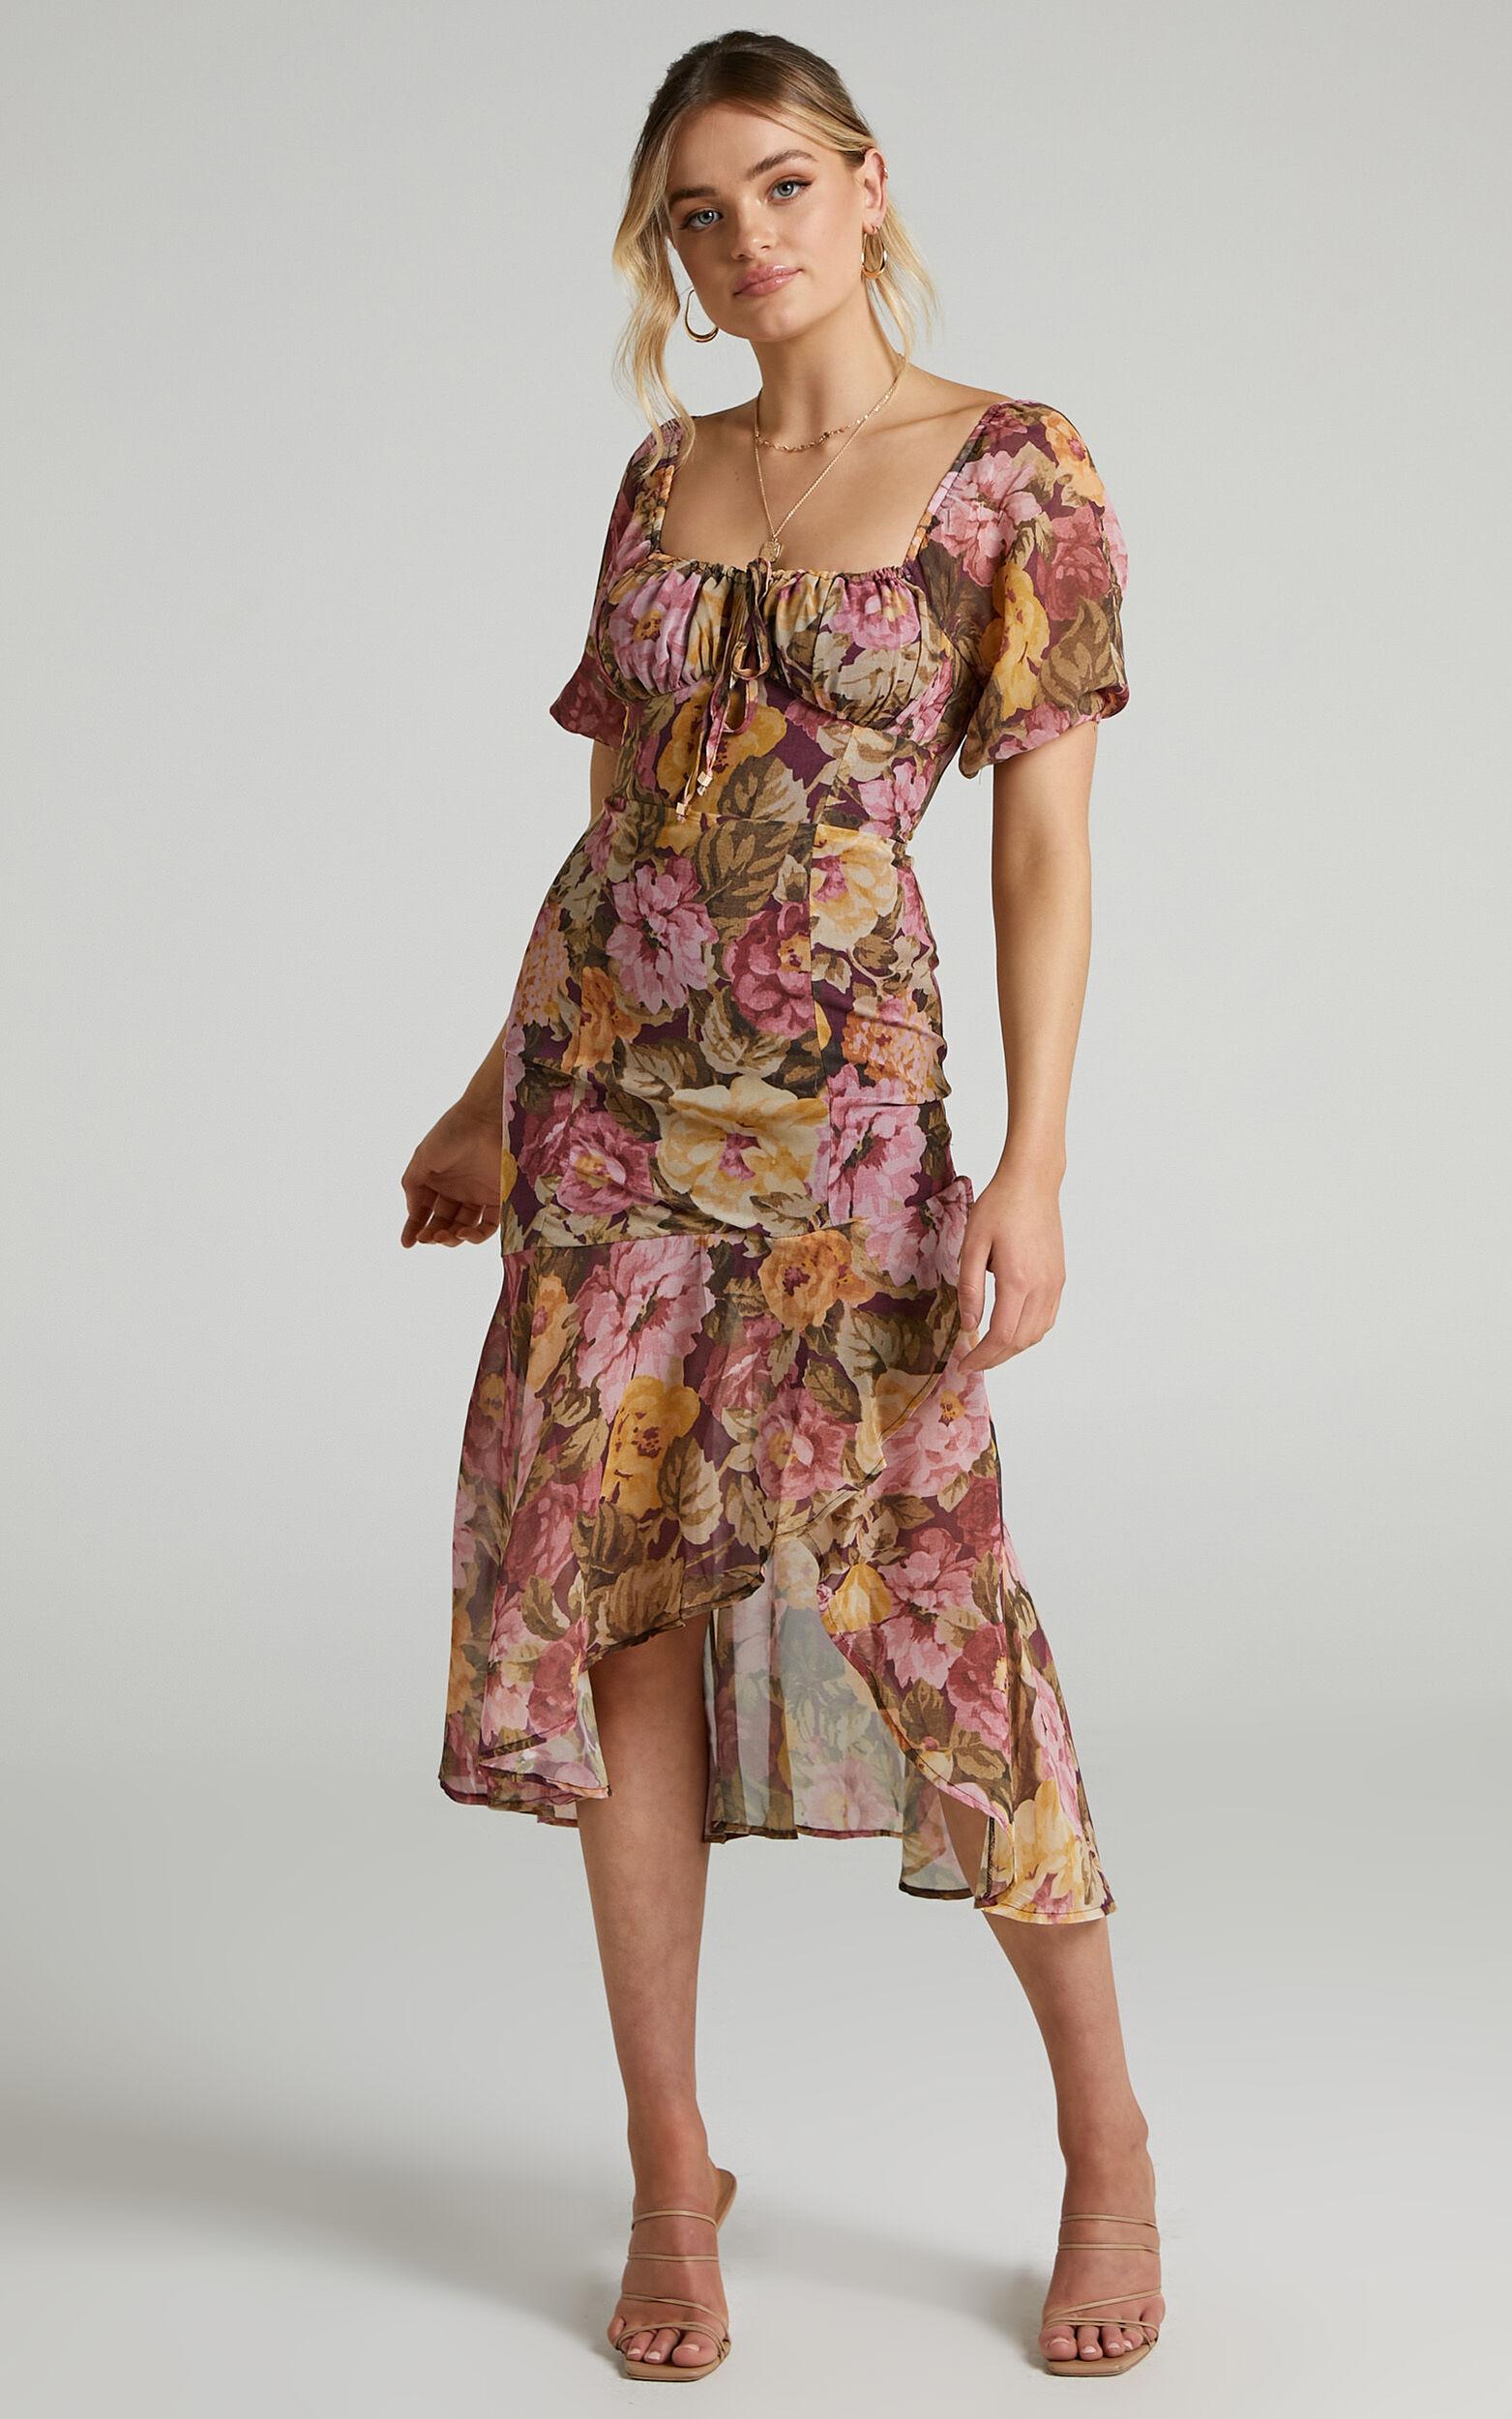 Jasalina Dress in Classic Floral - 06, PNK1, super-hi-res image number null